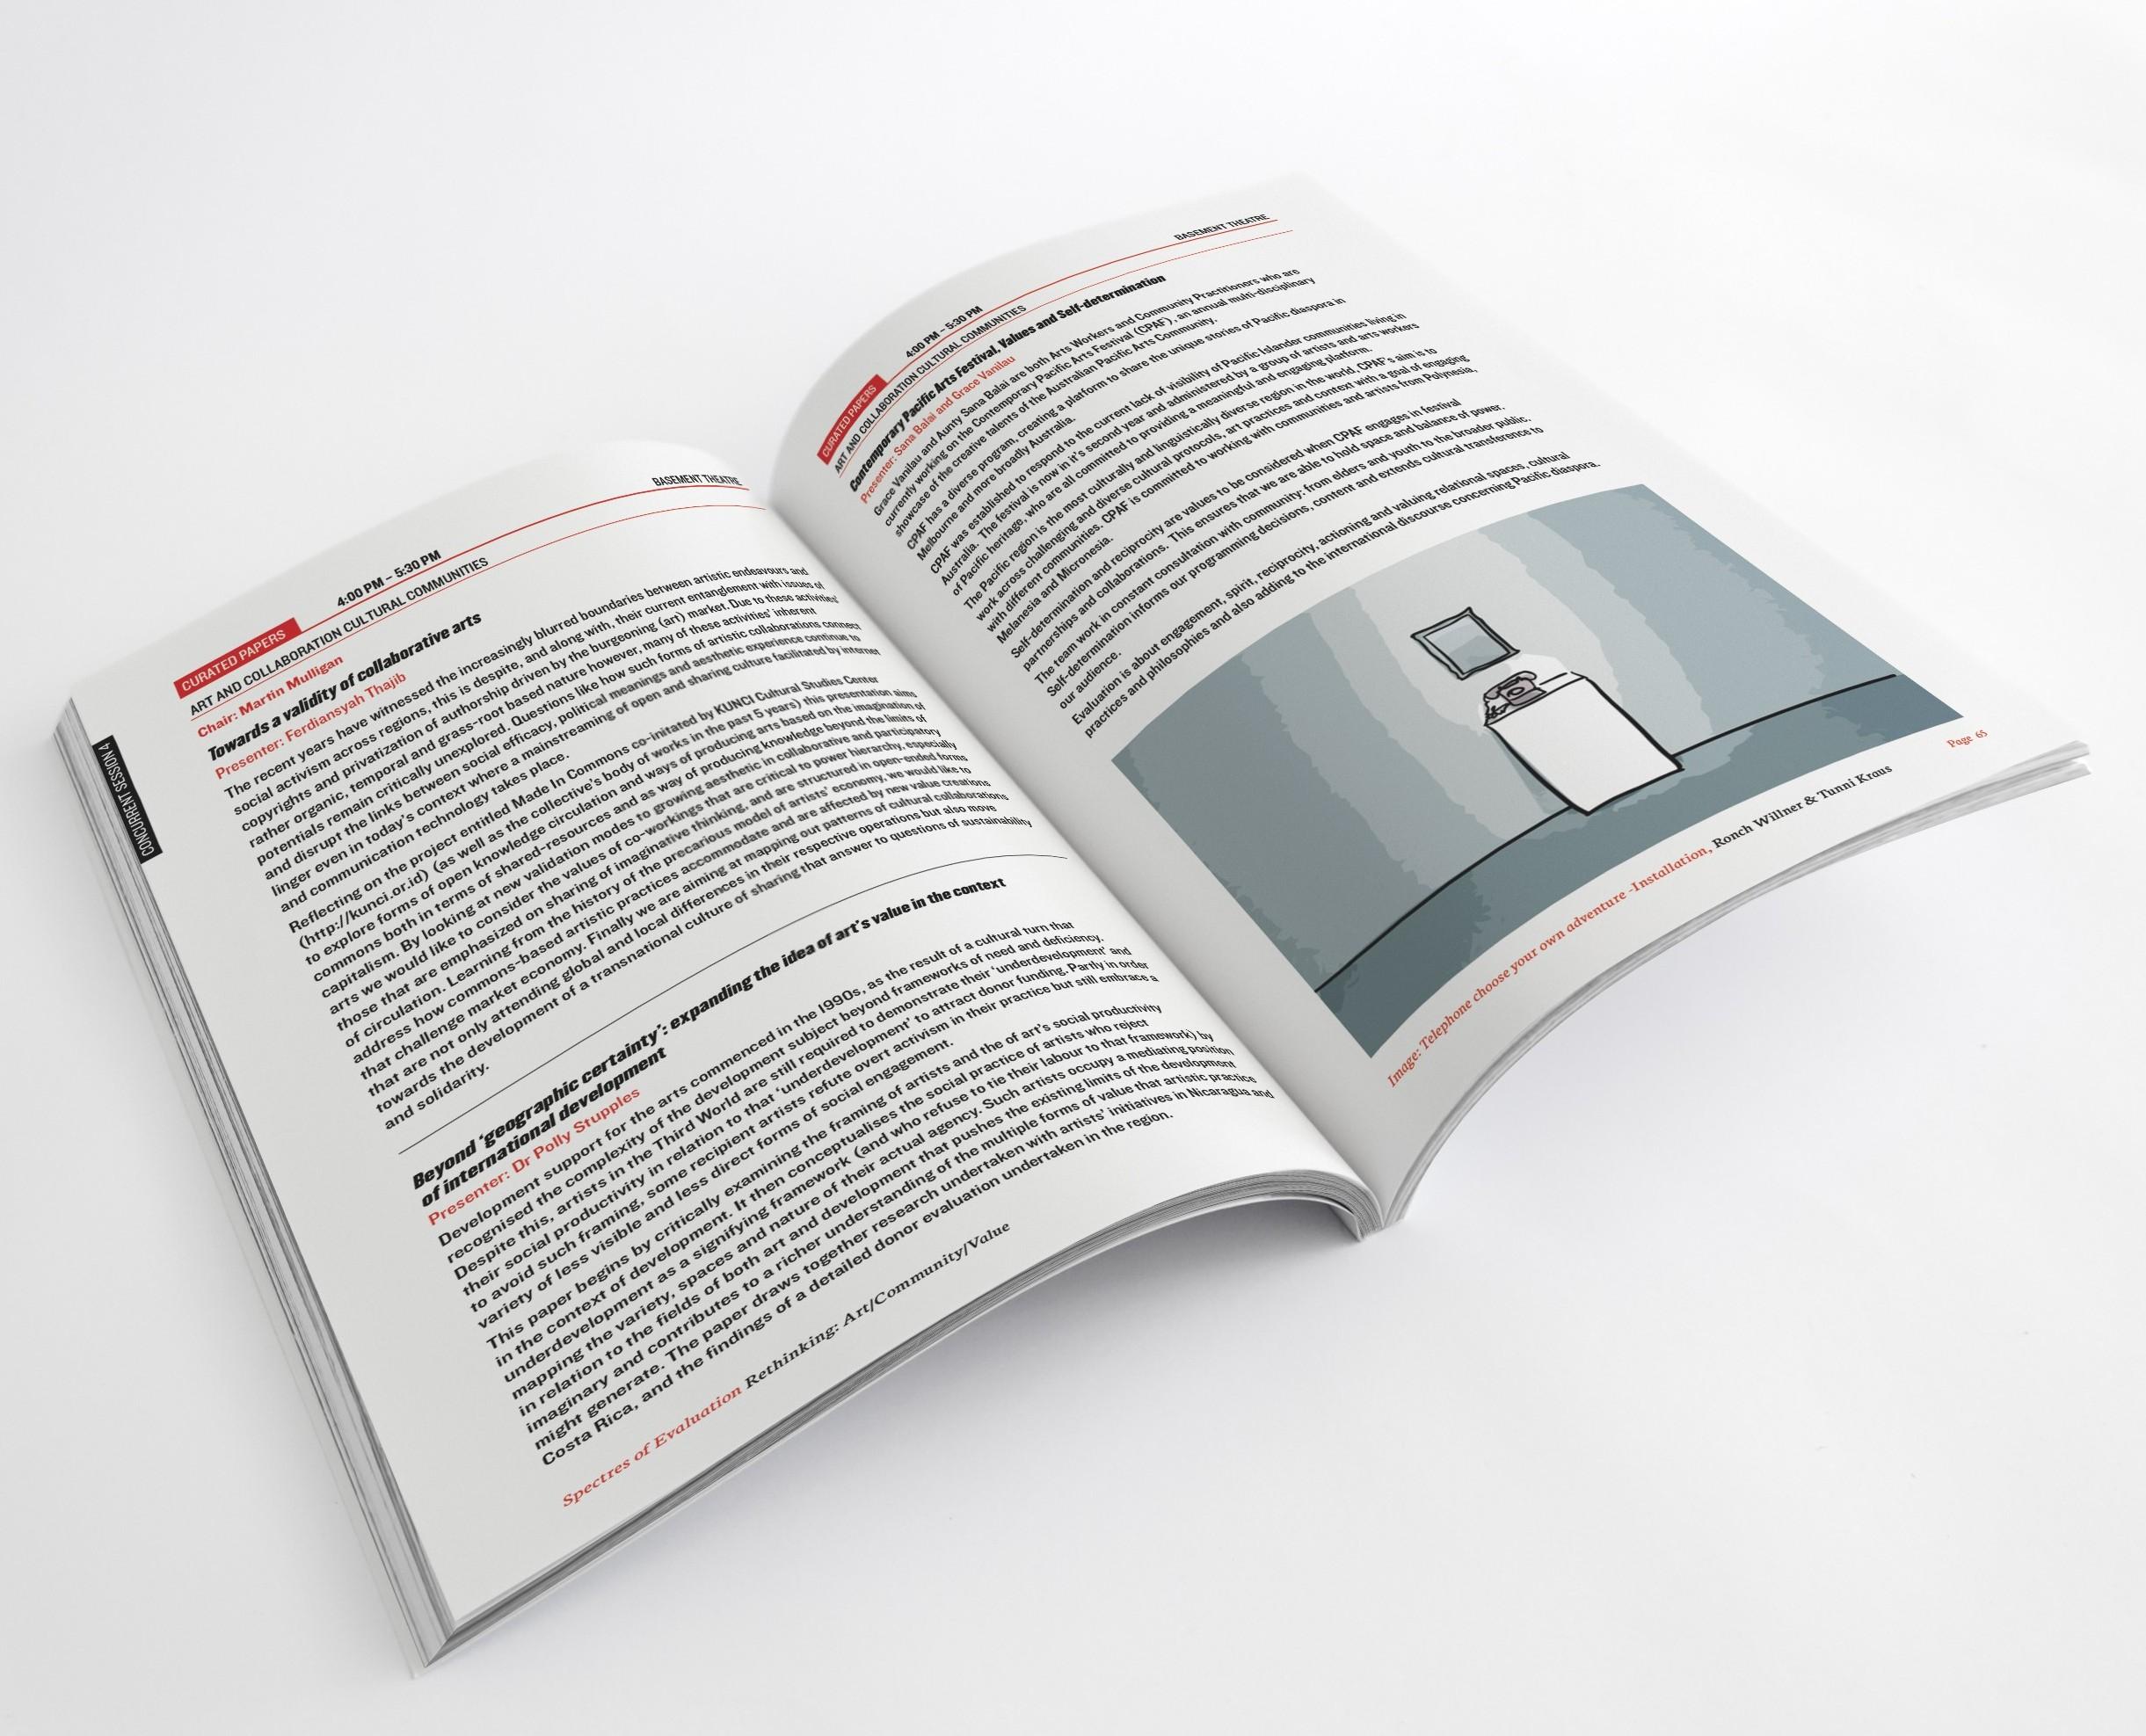 Conference Book Design